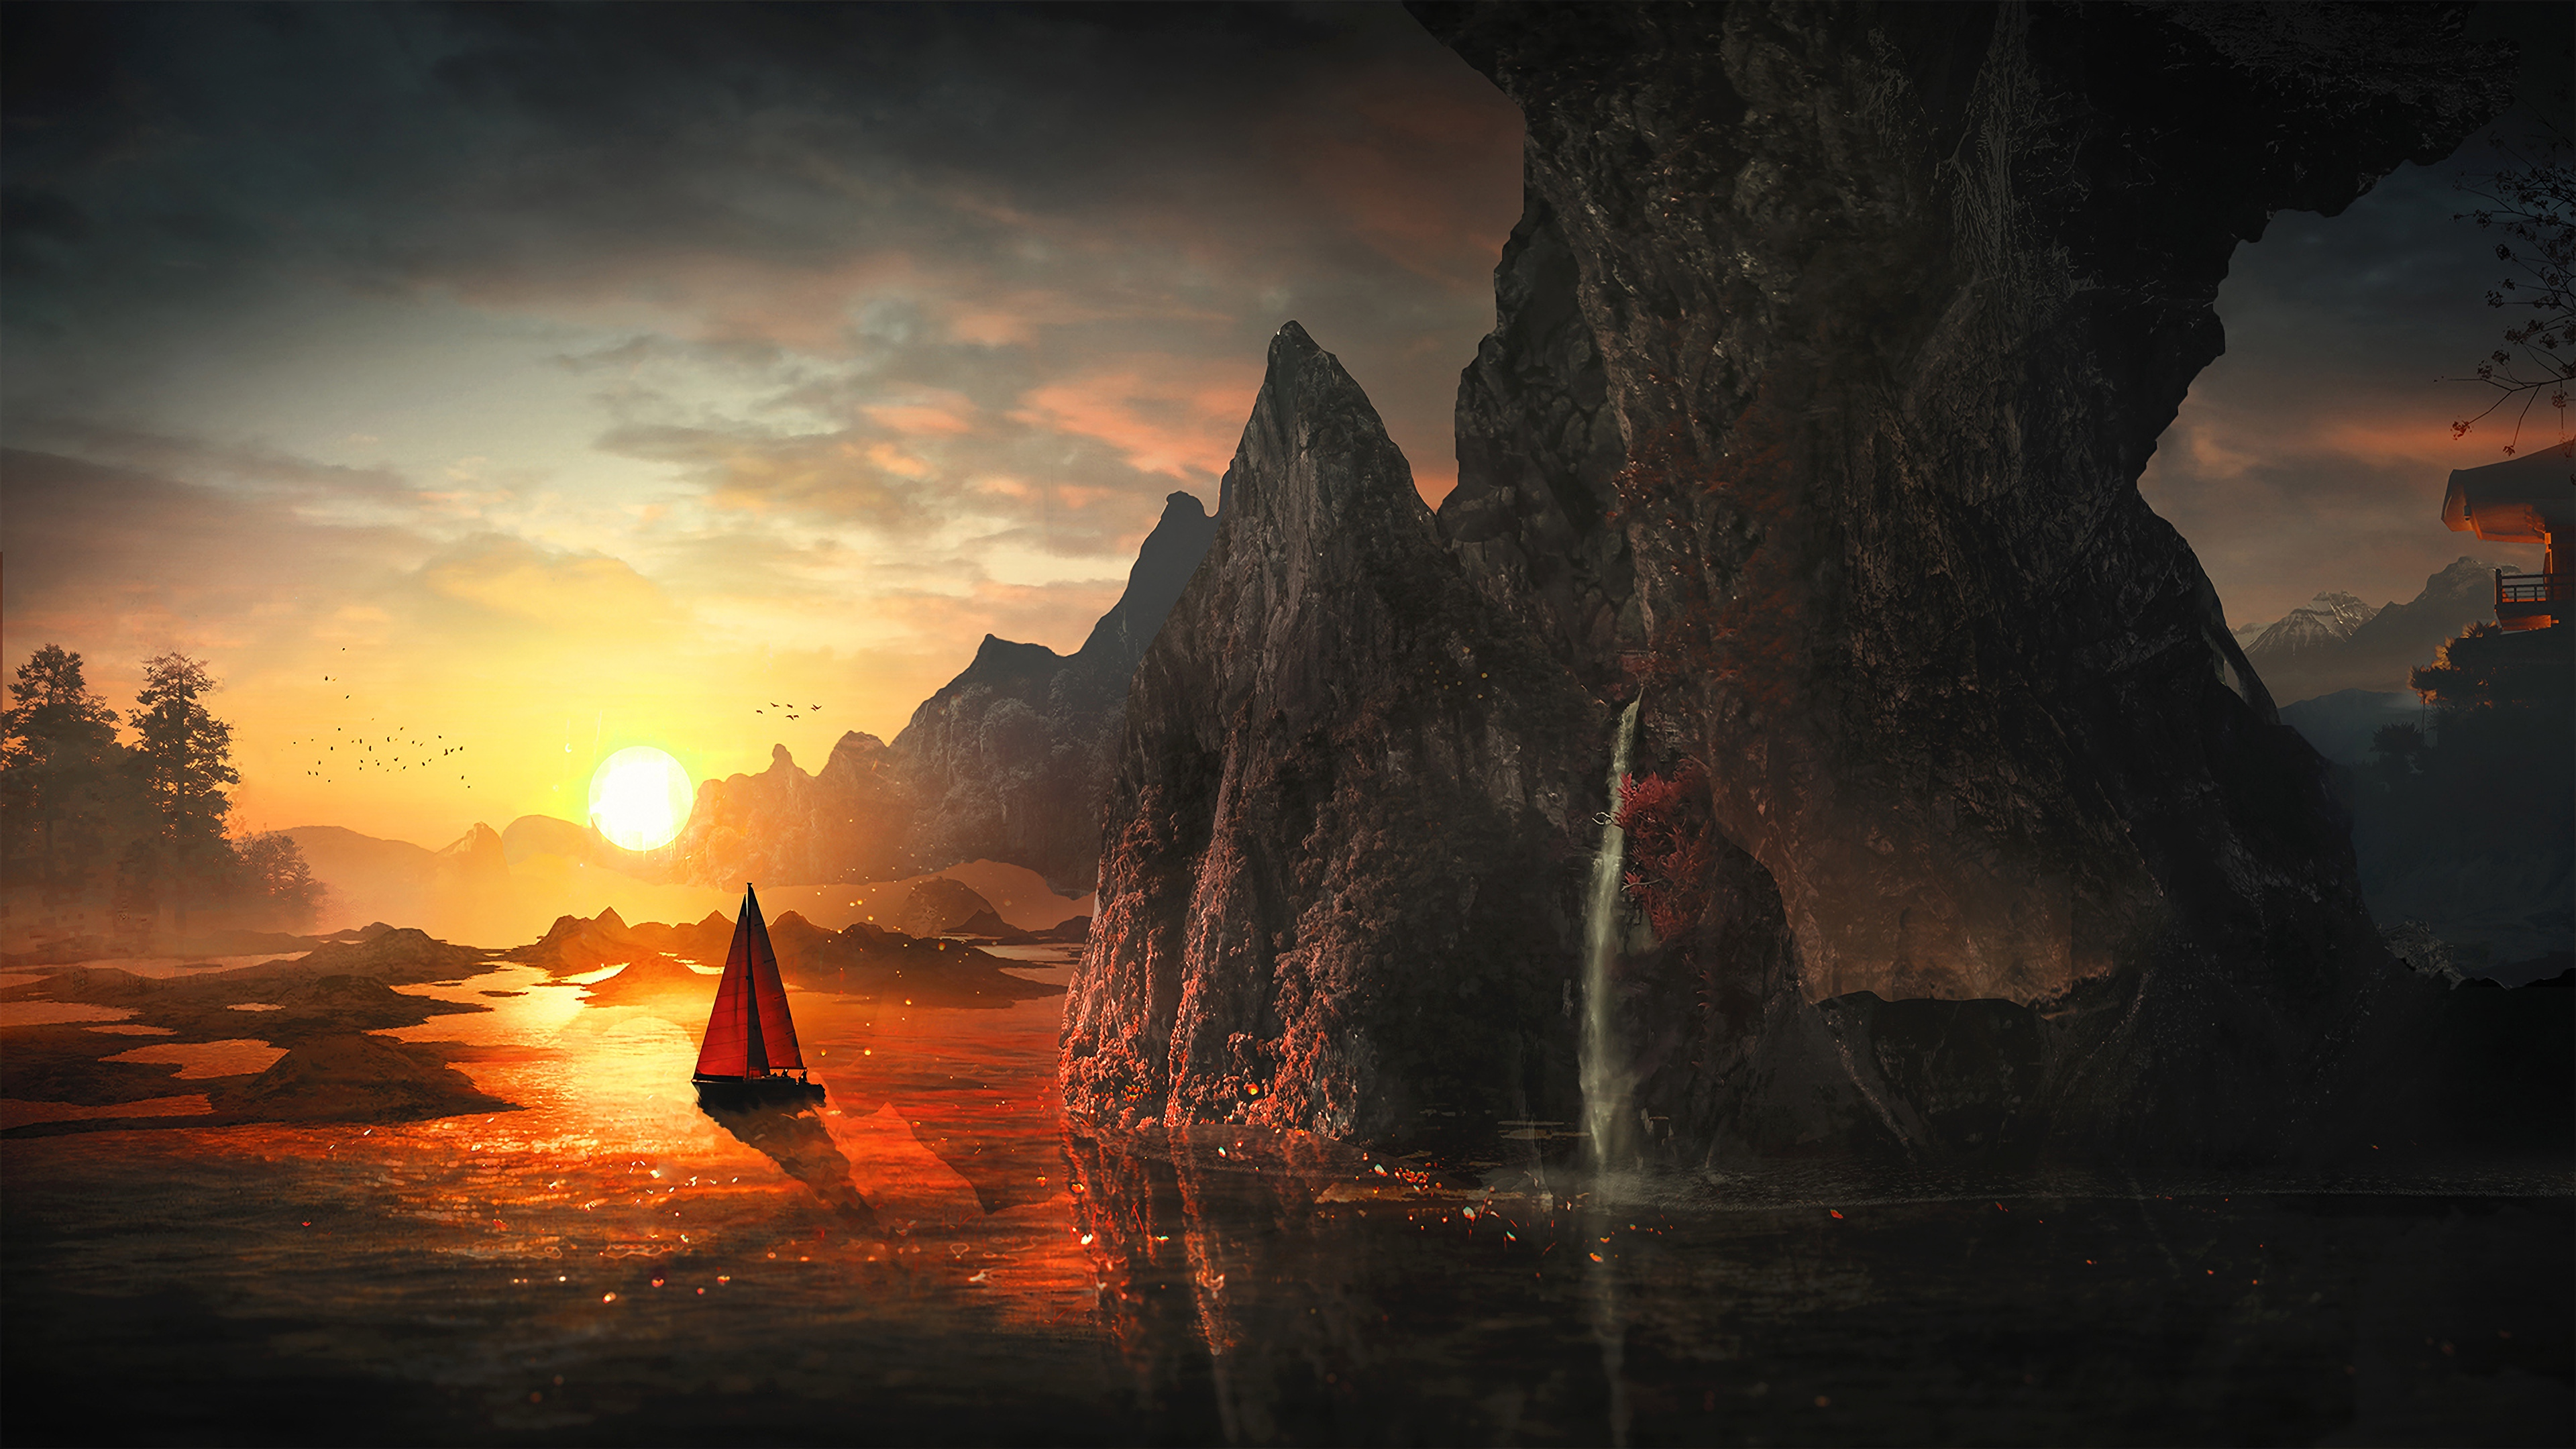 sail sunset bay art 4k 1541971373 - sail, sunset, bay, art 4k - sunset, Sail, Bay